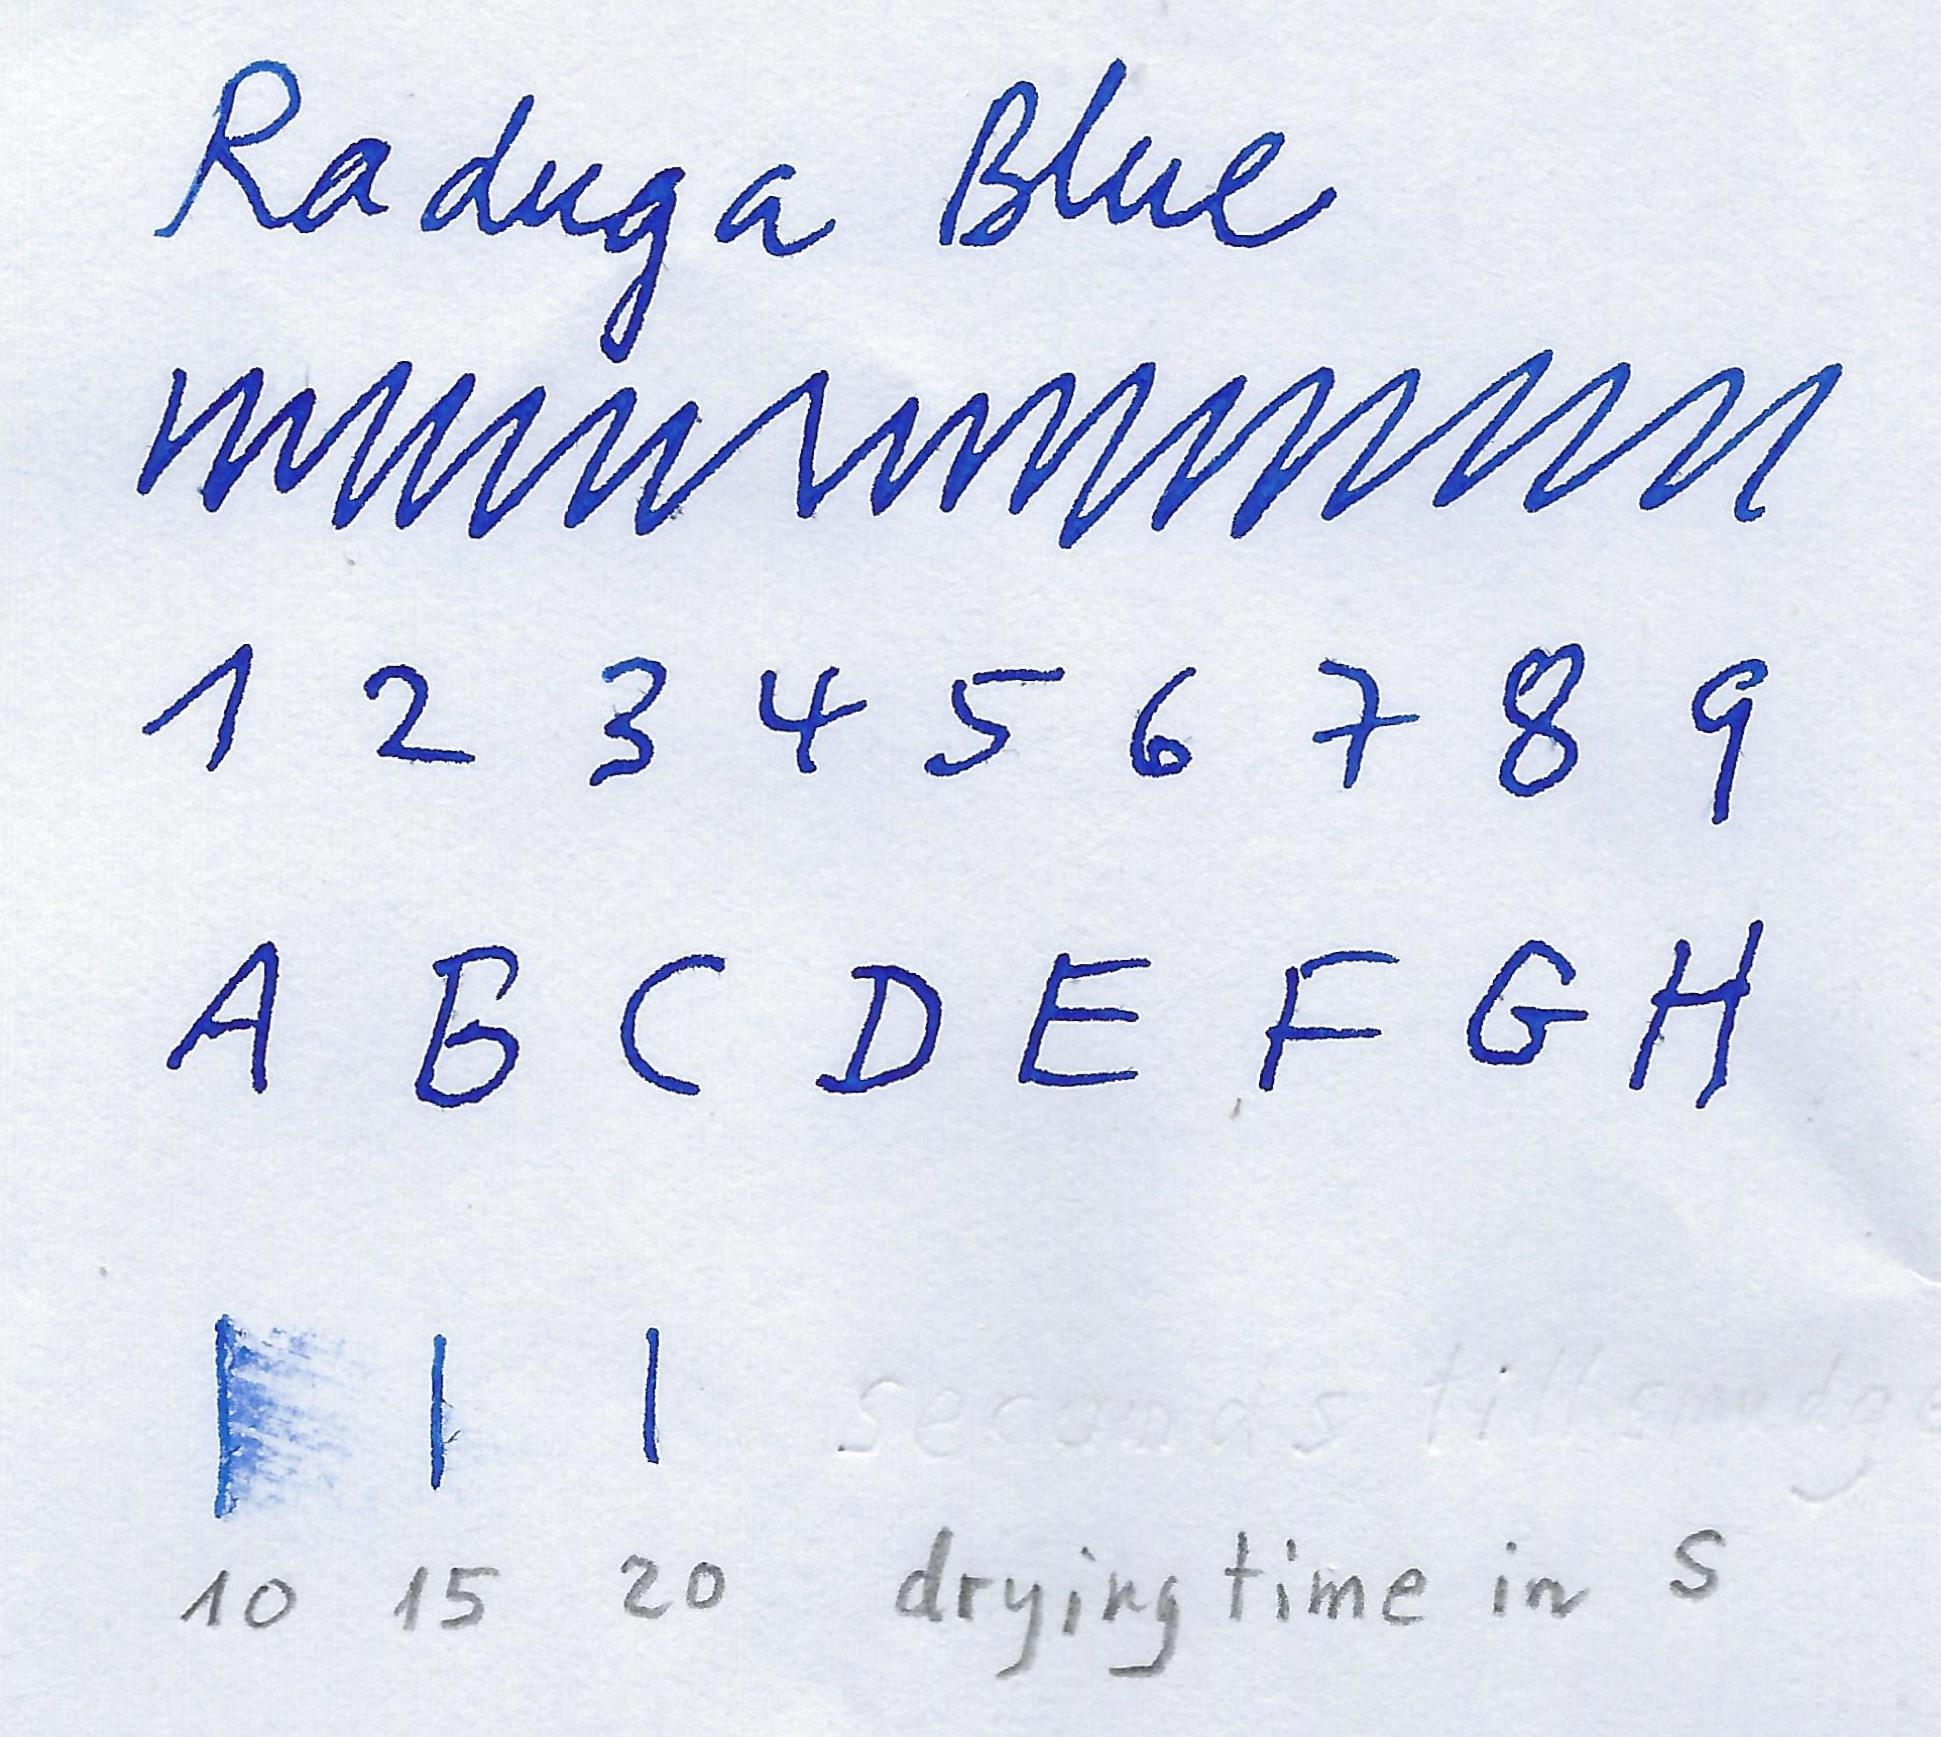 fpn_1596902155__raduga_blue_2020-08-08.j